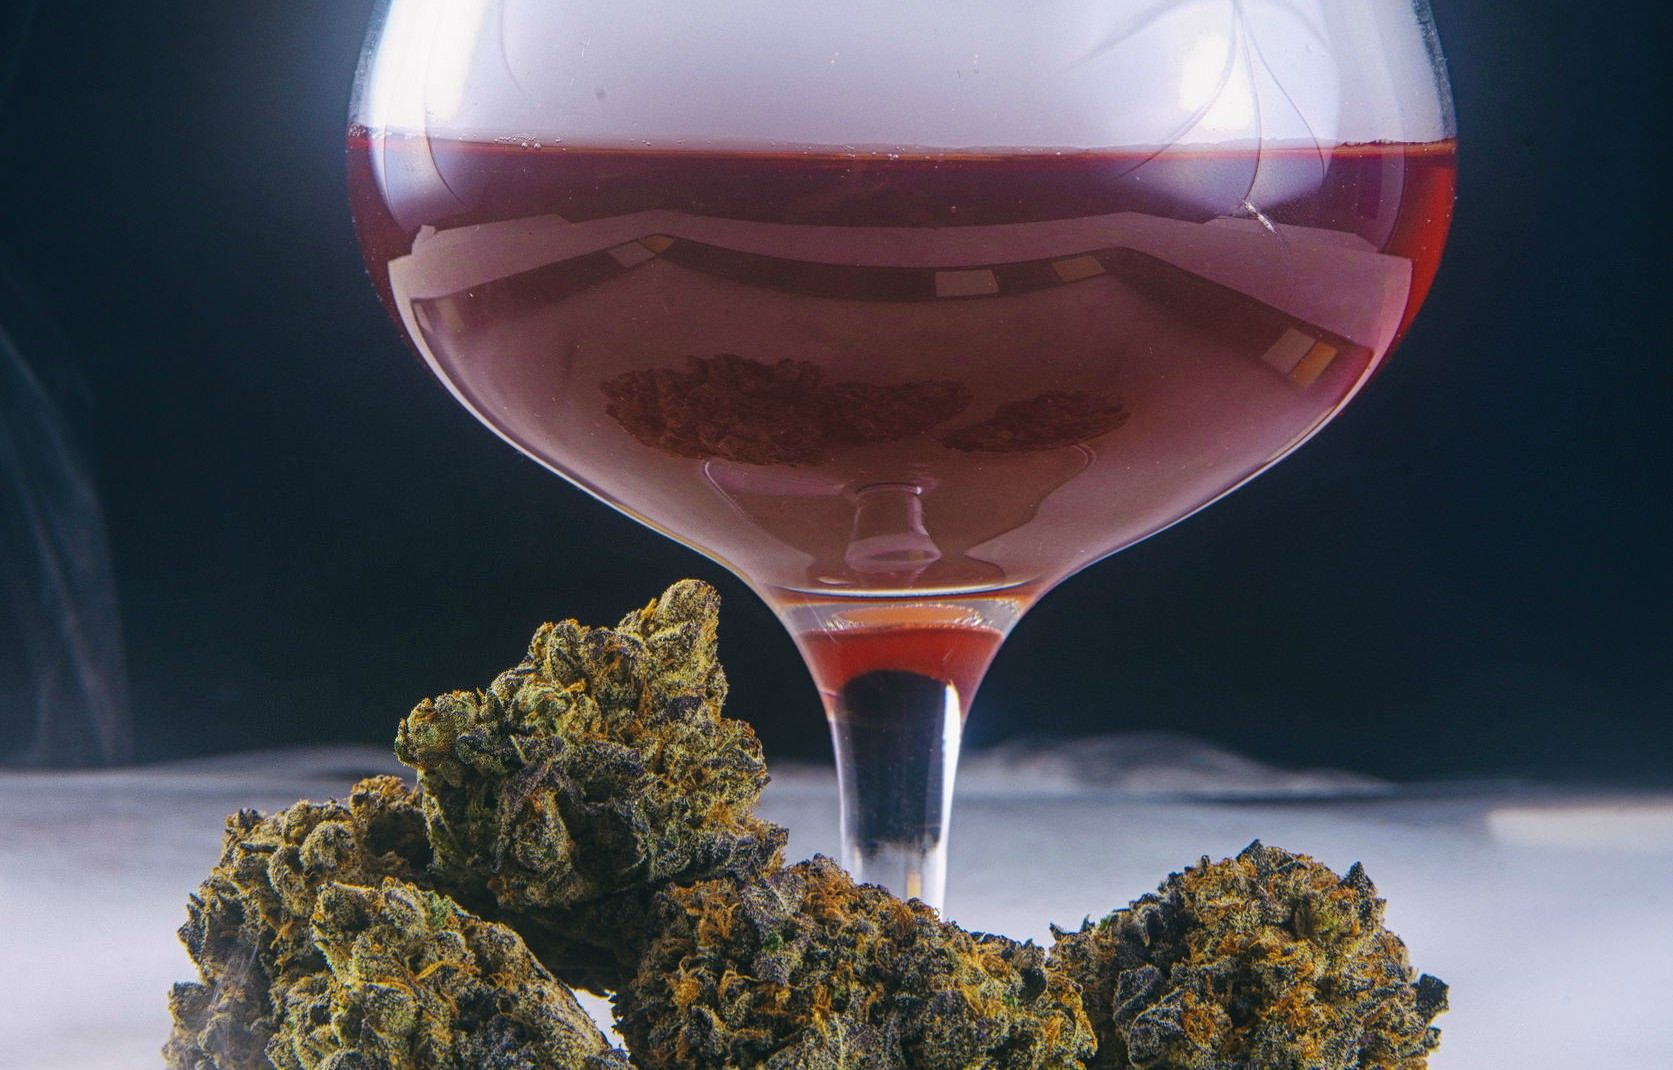 cannabis alcohol association, Key US alcohol trade group endorses legalization of recreational cannabis